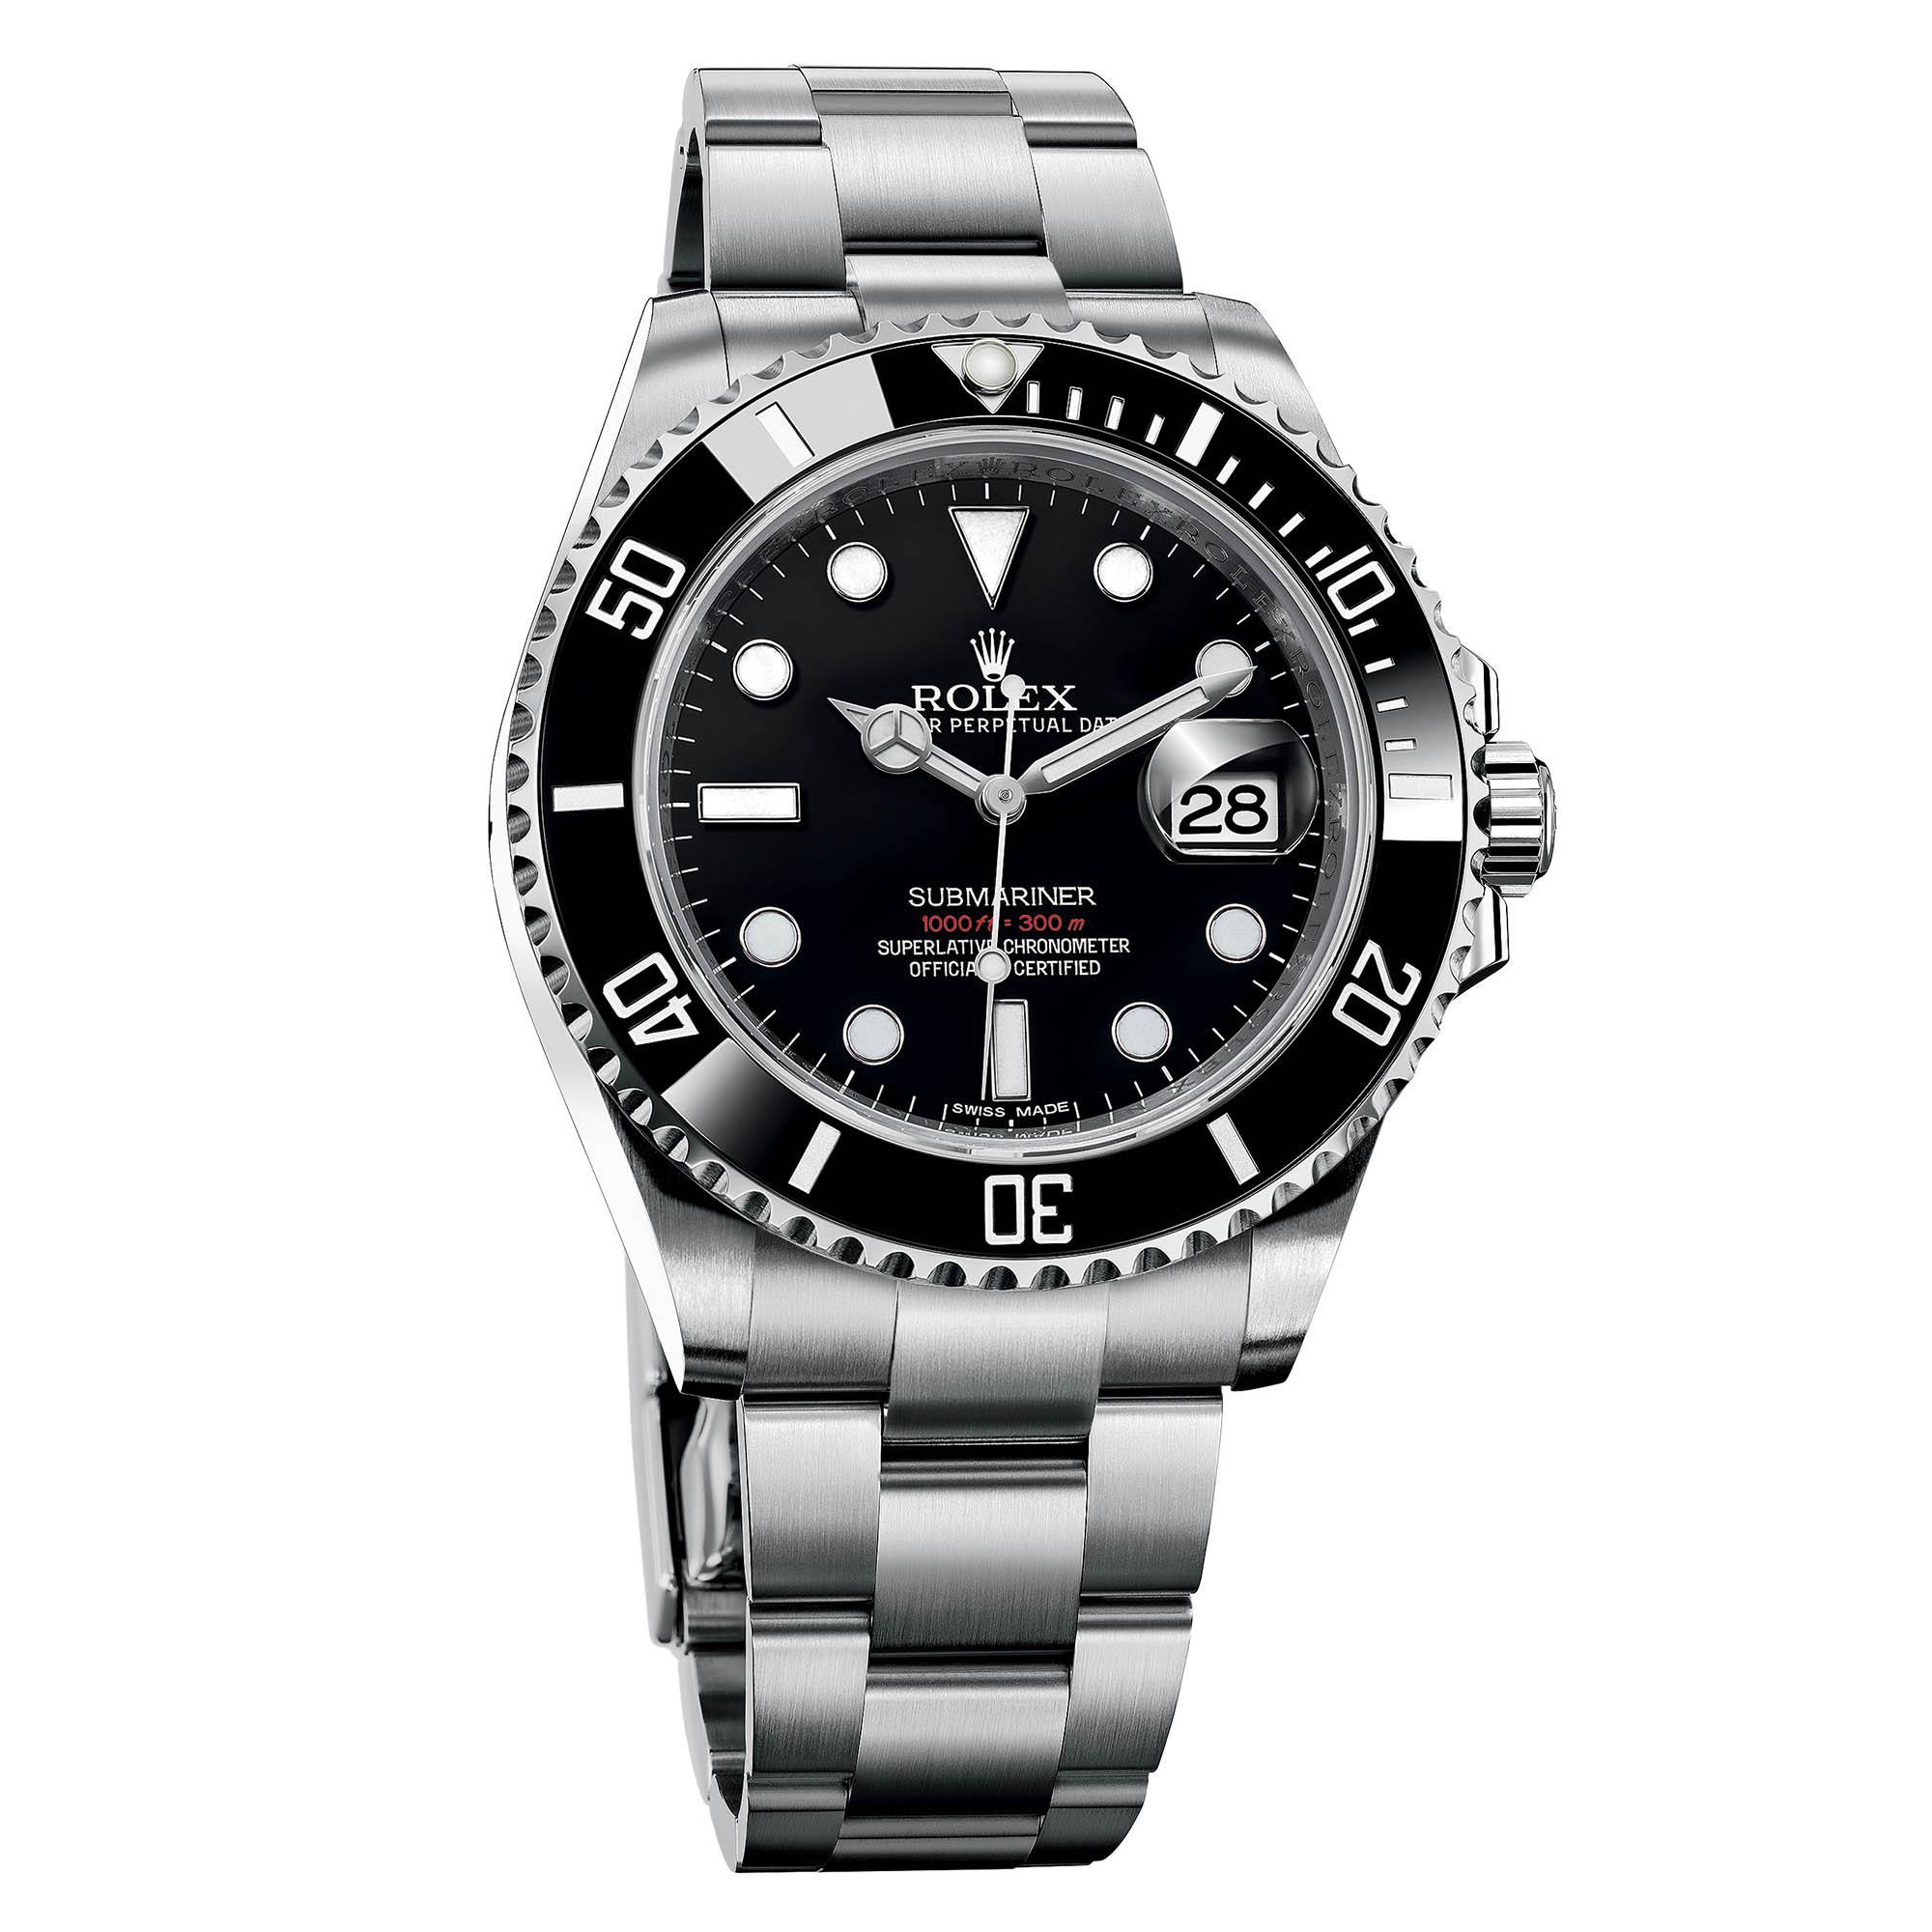 Rolex Submariner 126610LN Oyster steel bracelet calibre 3235 - Rolex Baselworld 2018 - Rolex Predictions 2018